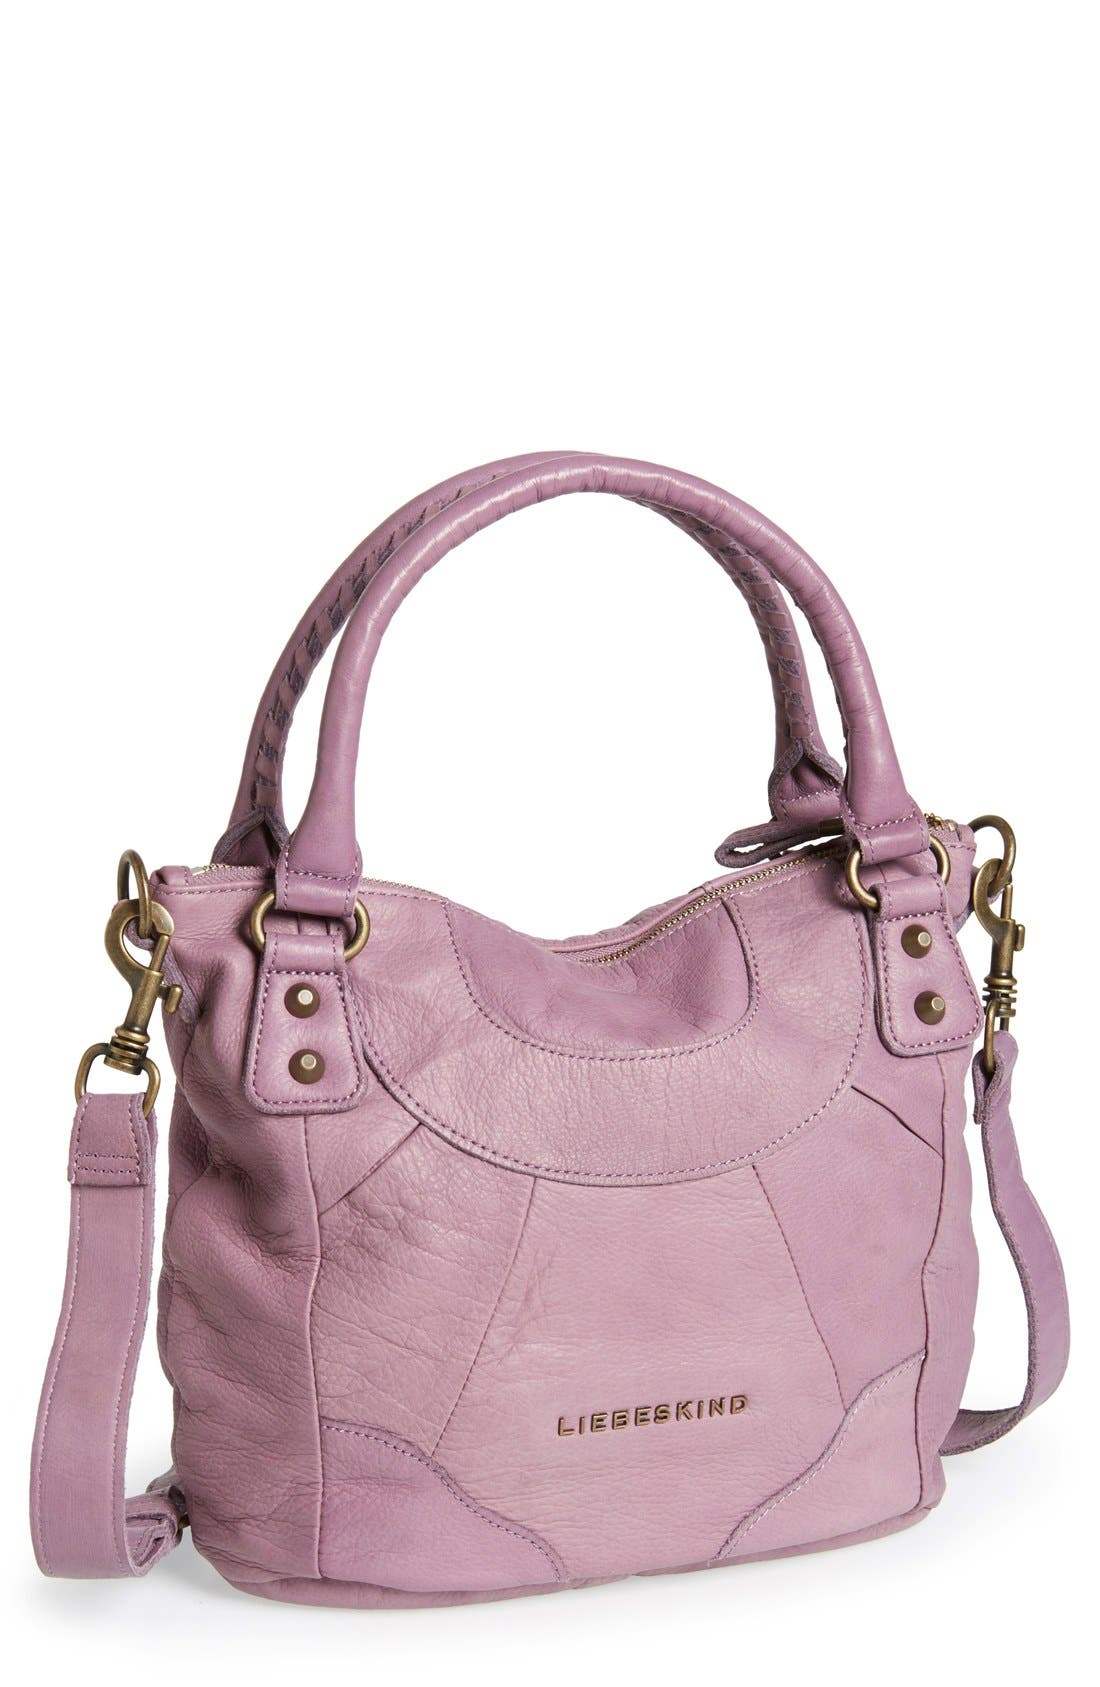 Main Image - Liebeskind 'Vintage Gina' Soft Leather Handbag